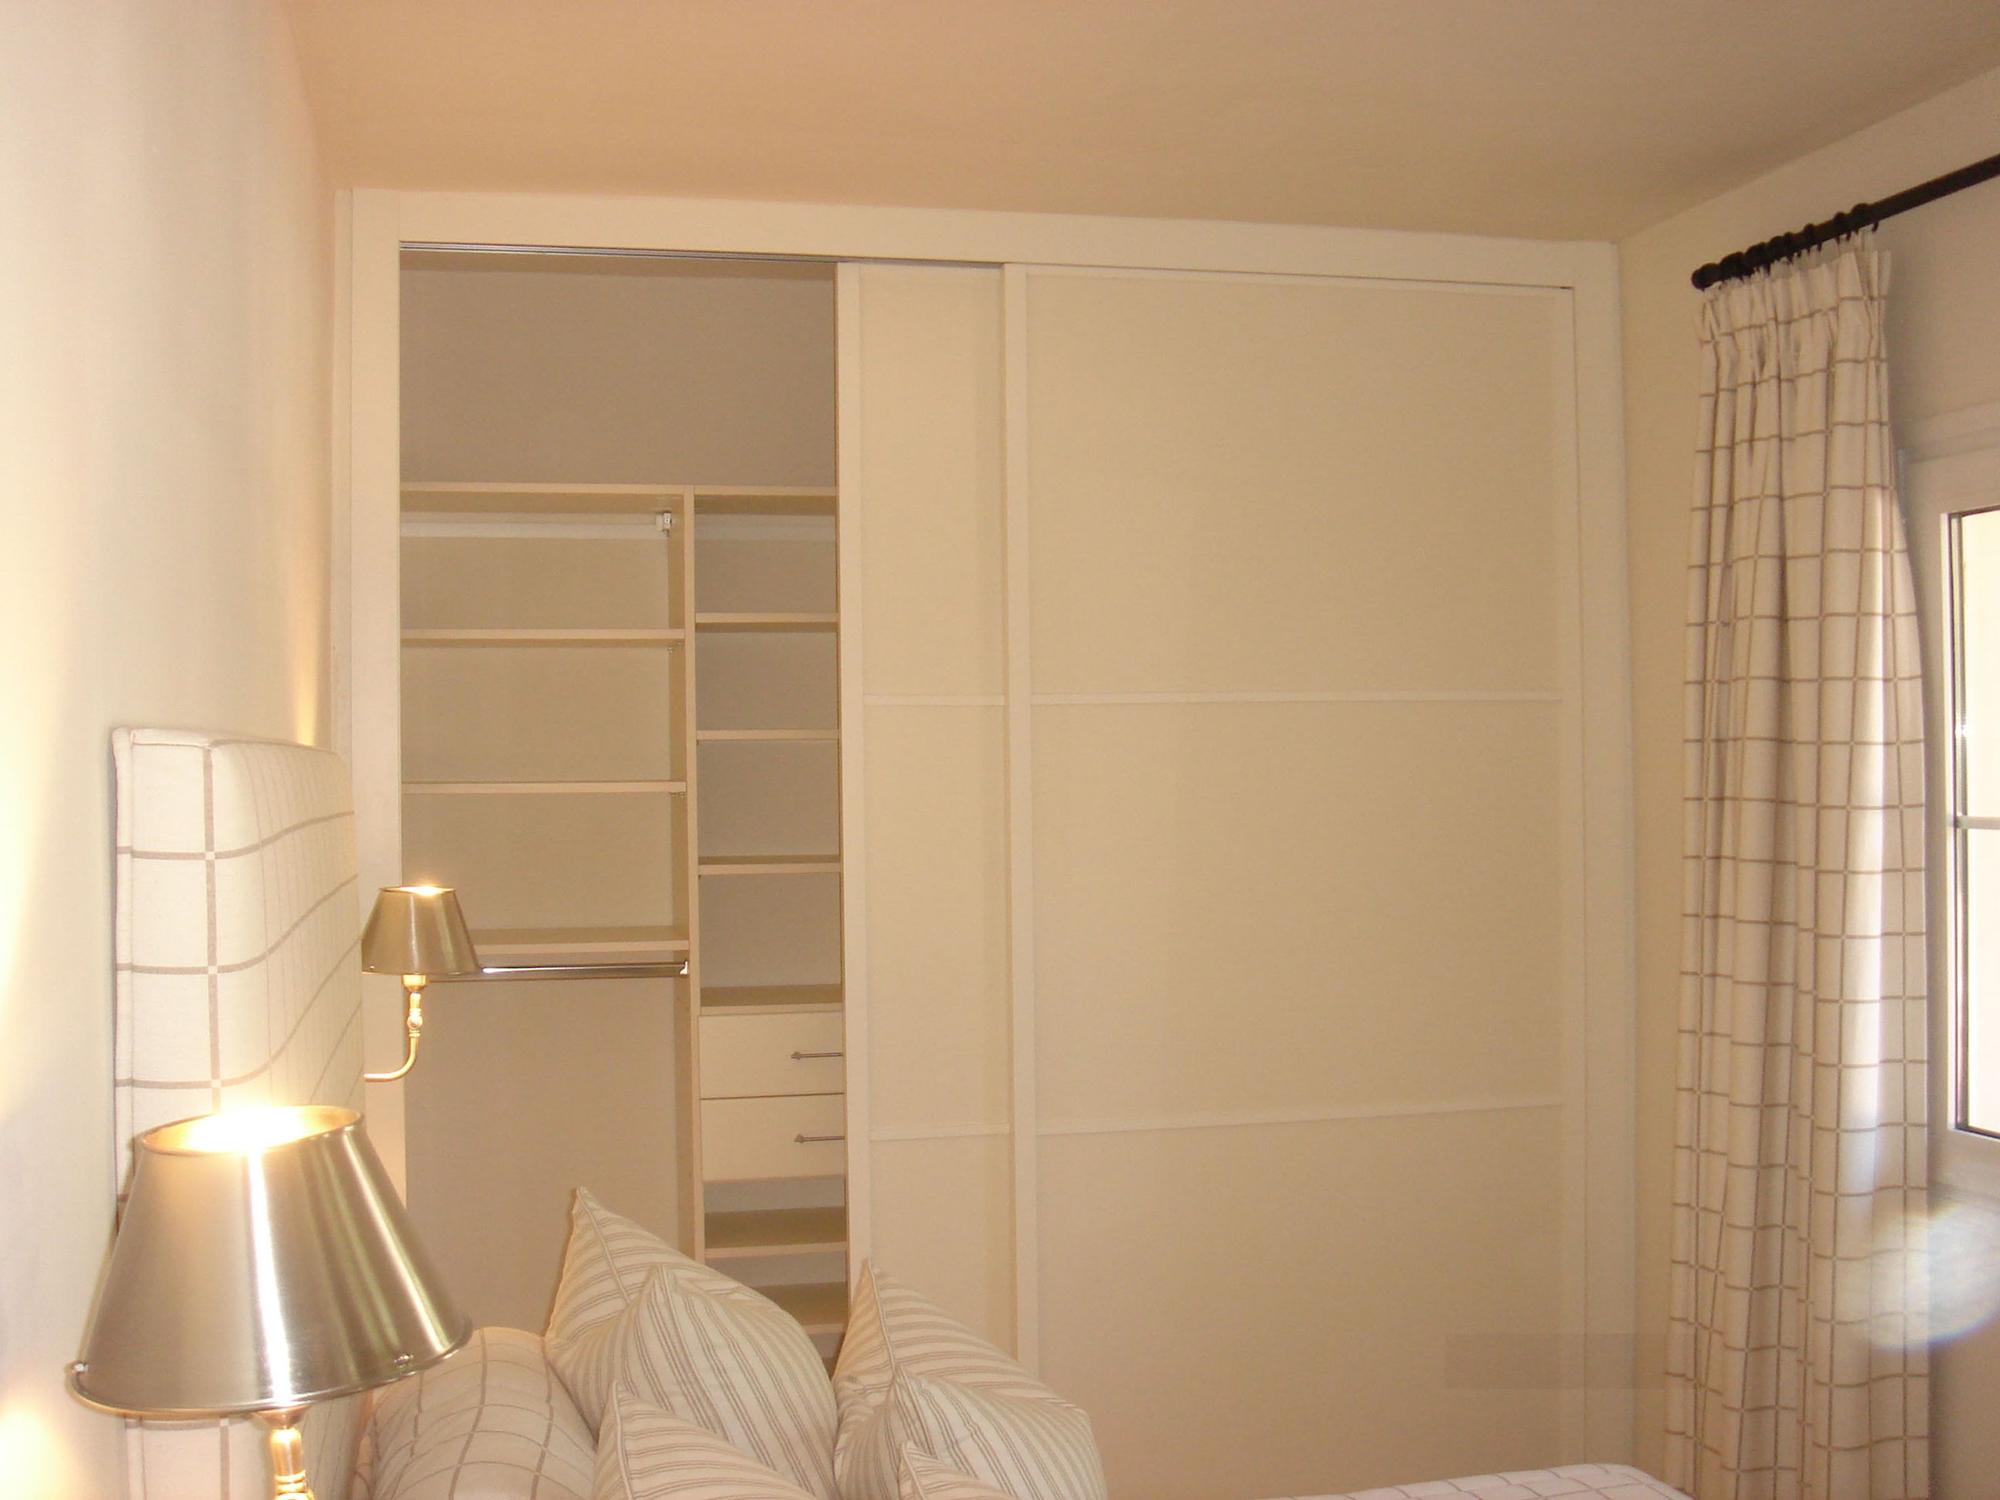 Frentes de armario a medida metrocloset for Construir puerta corredera